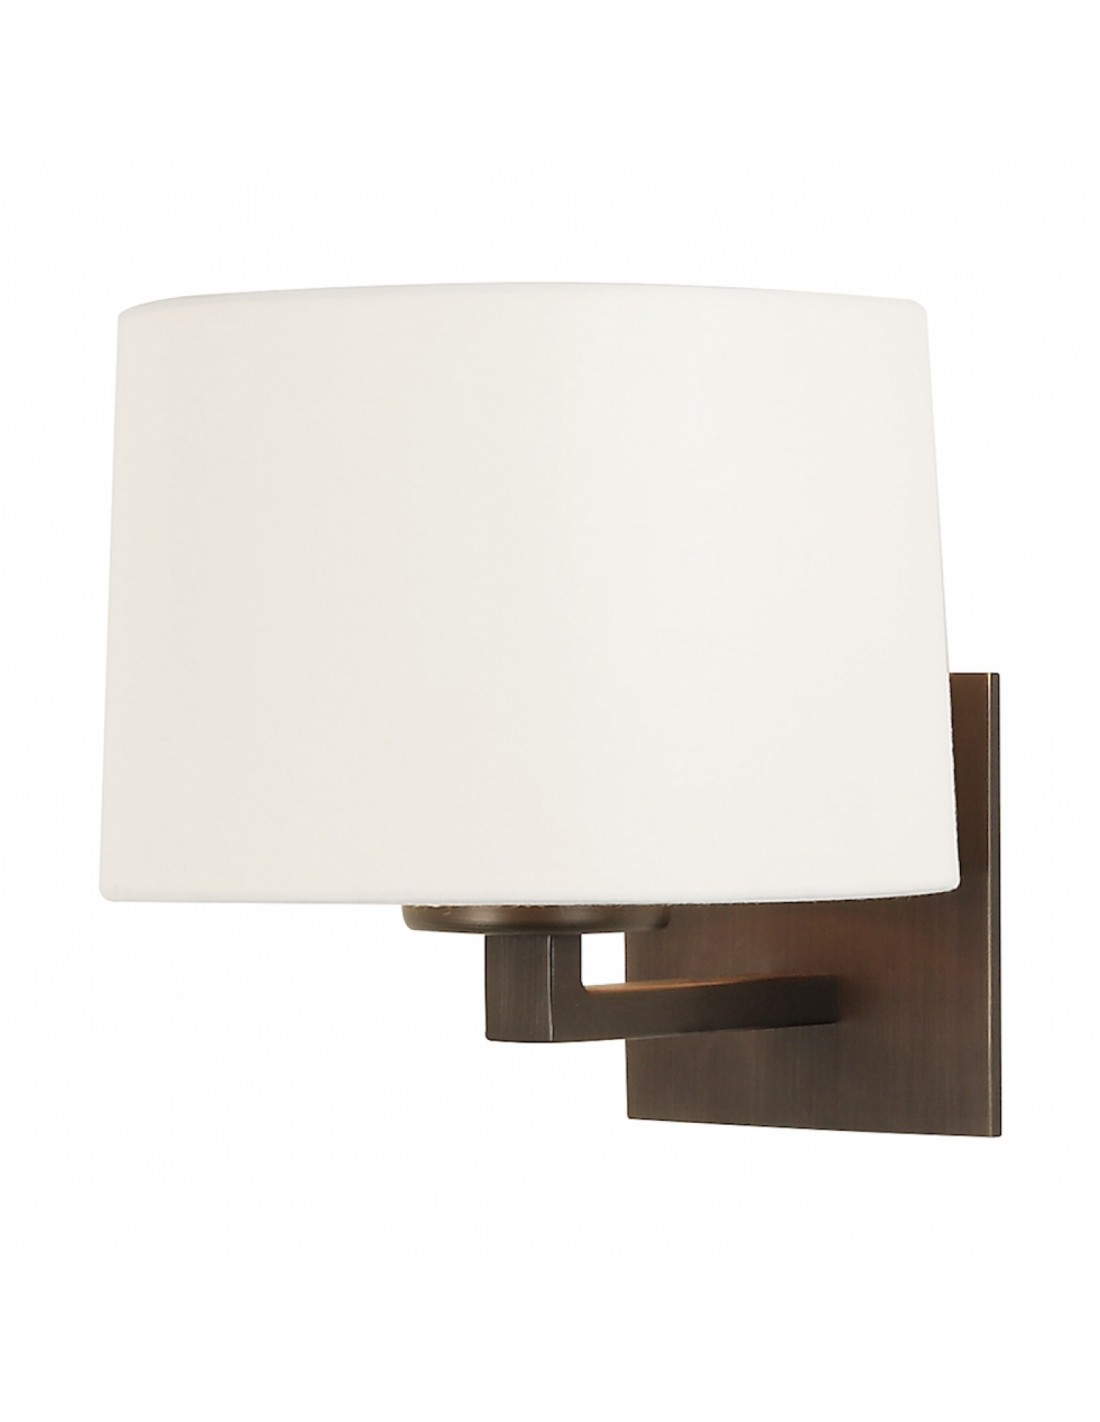 applique mural azumi bronze abat jour rond tissu blanc astro lighting. Black Bedroom Furniture Sets. Home Design Ideas